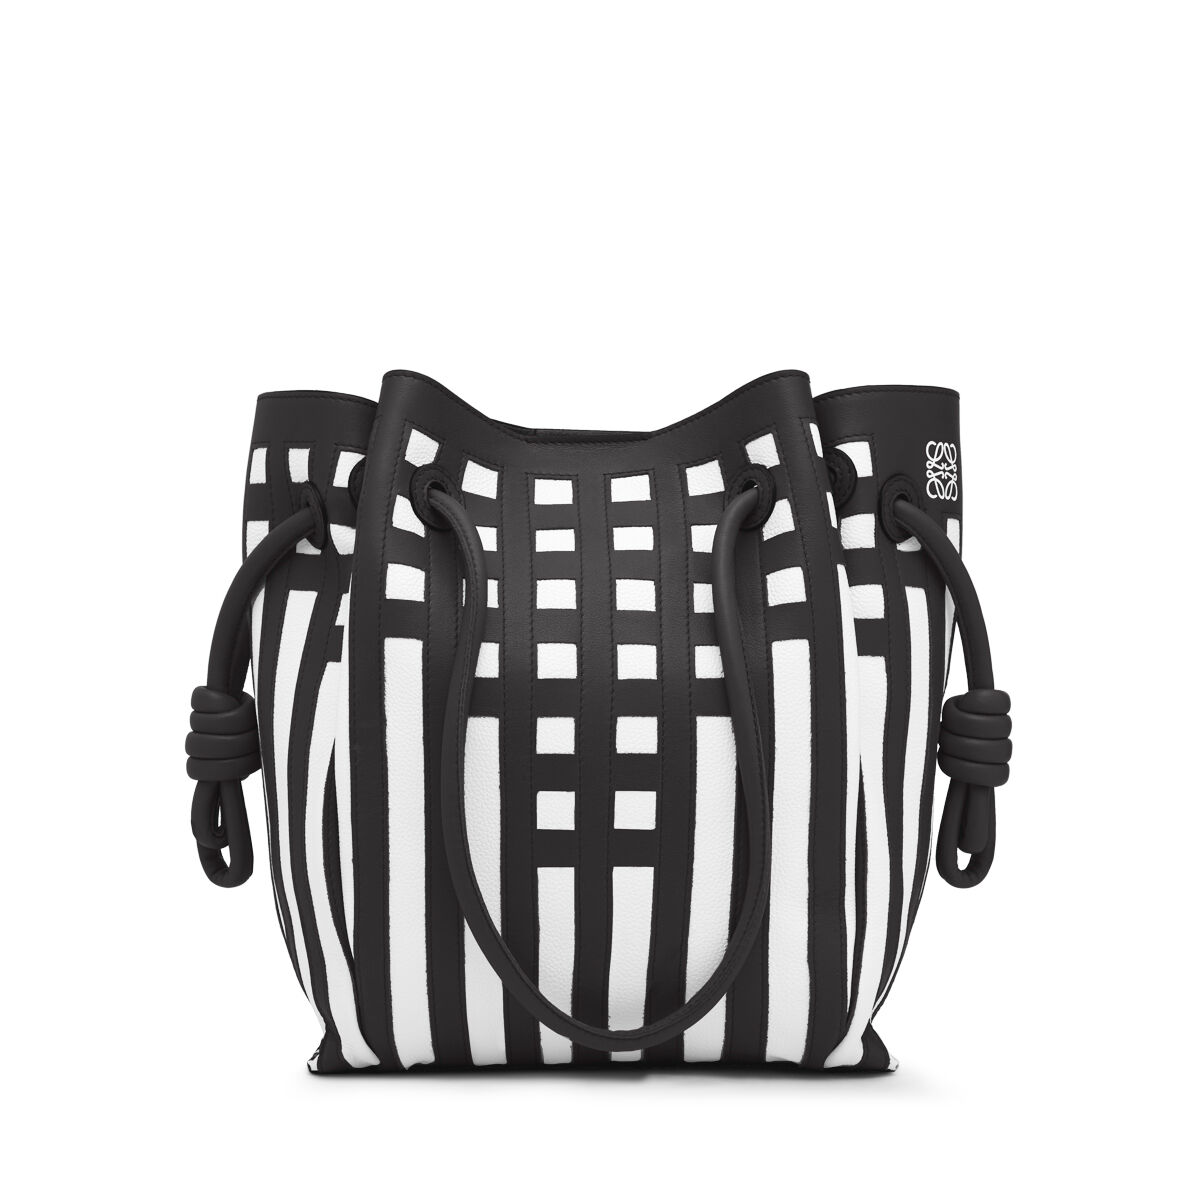 LOEWE Flamenco Knot Tote Grid S Bag 黑色/白色 all